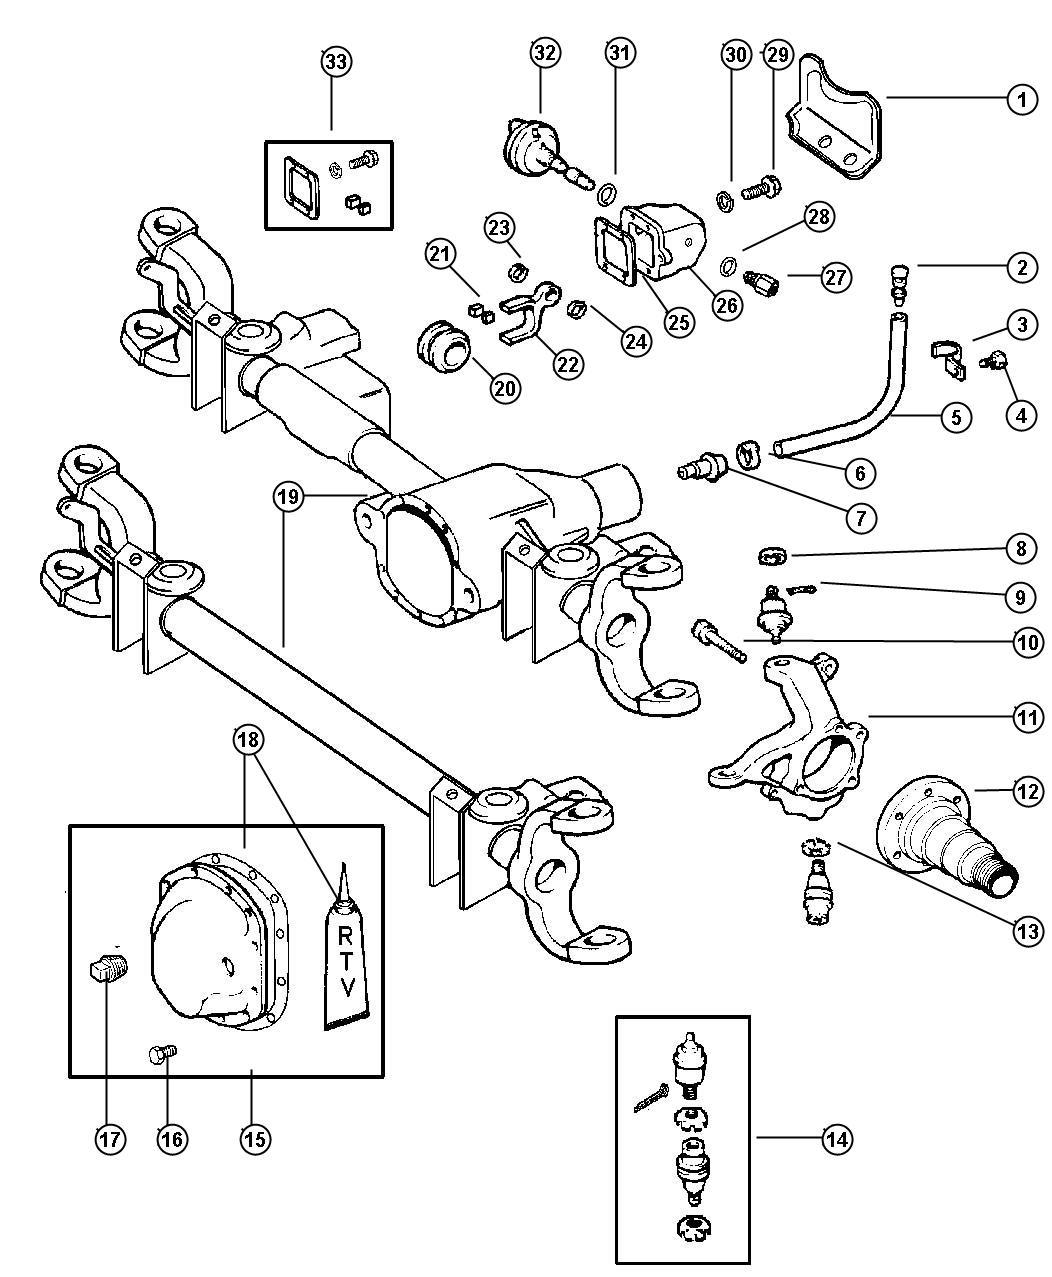 2000 Dodge Ram 2500 Sensor kit. Anti-lock brakes. Front